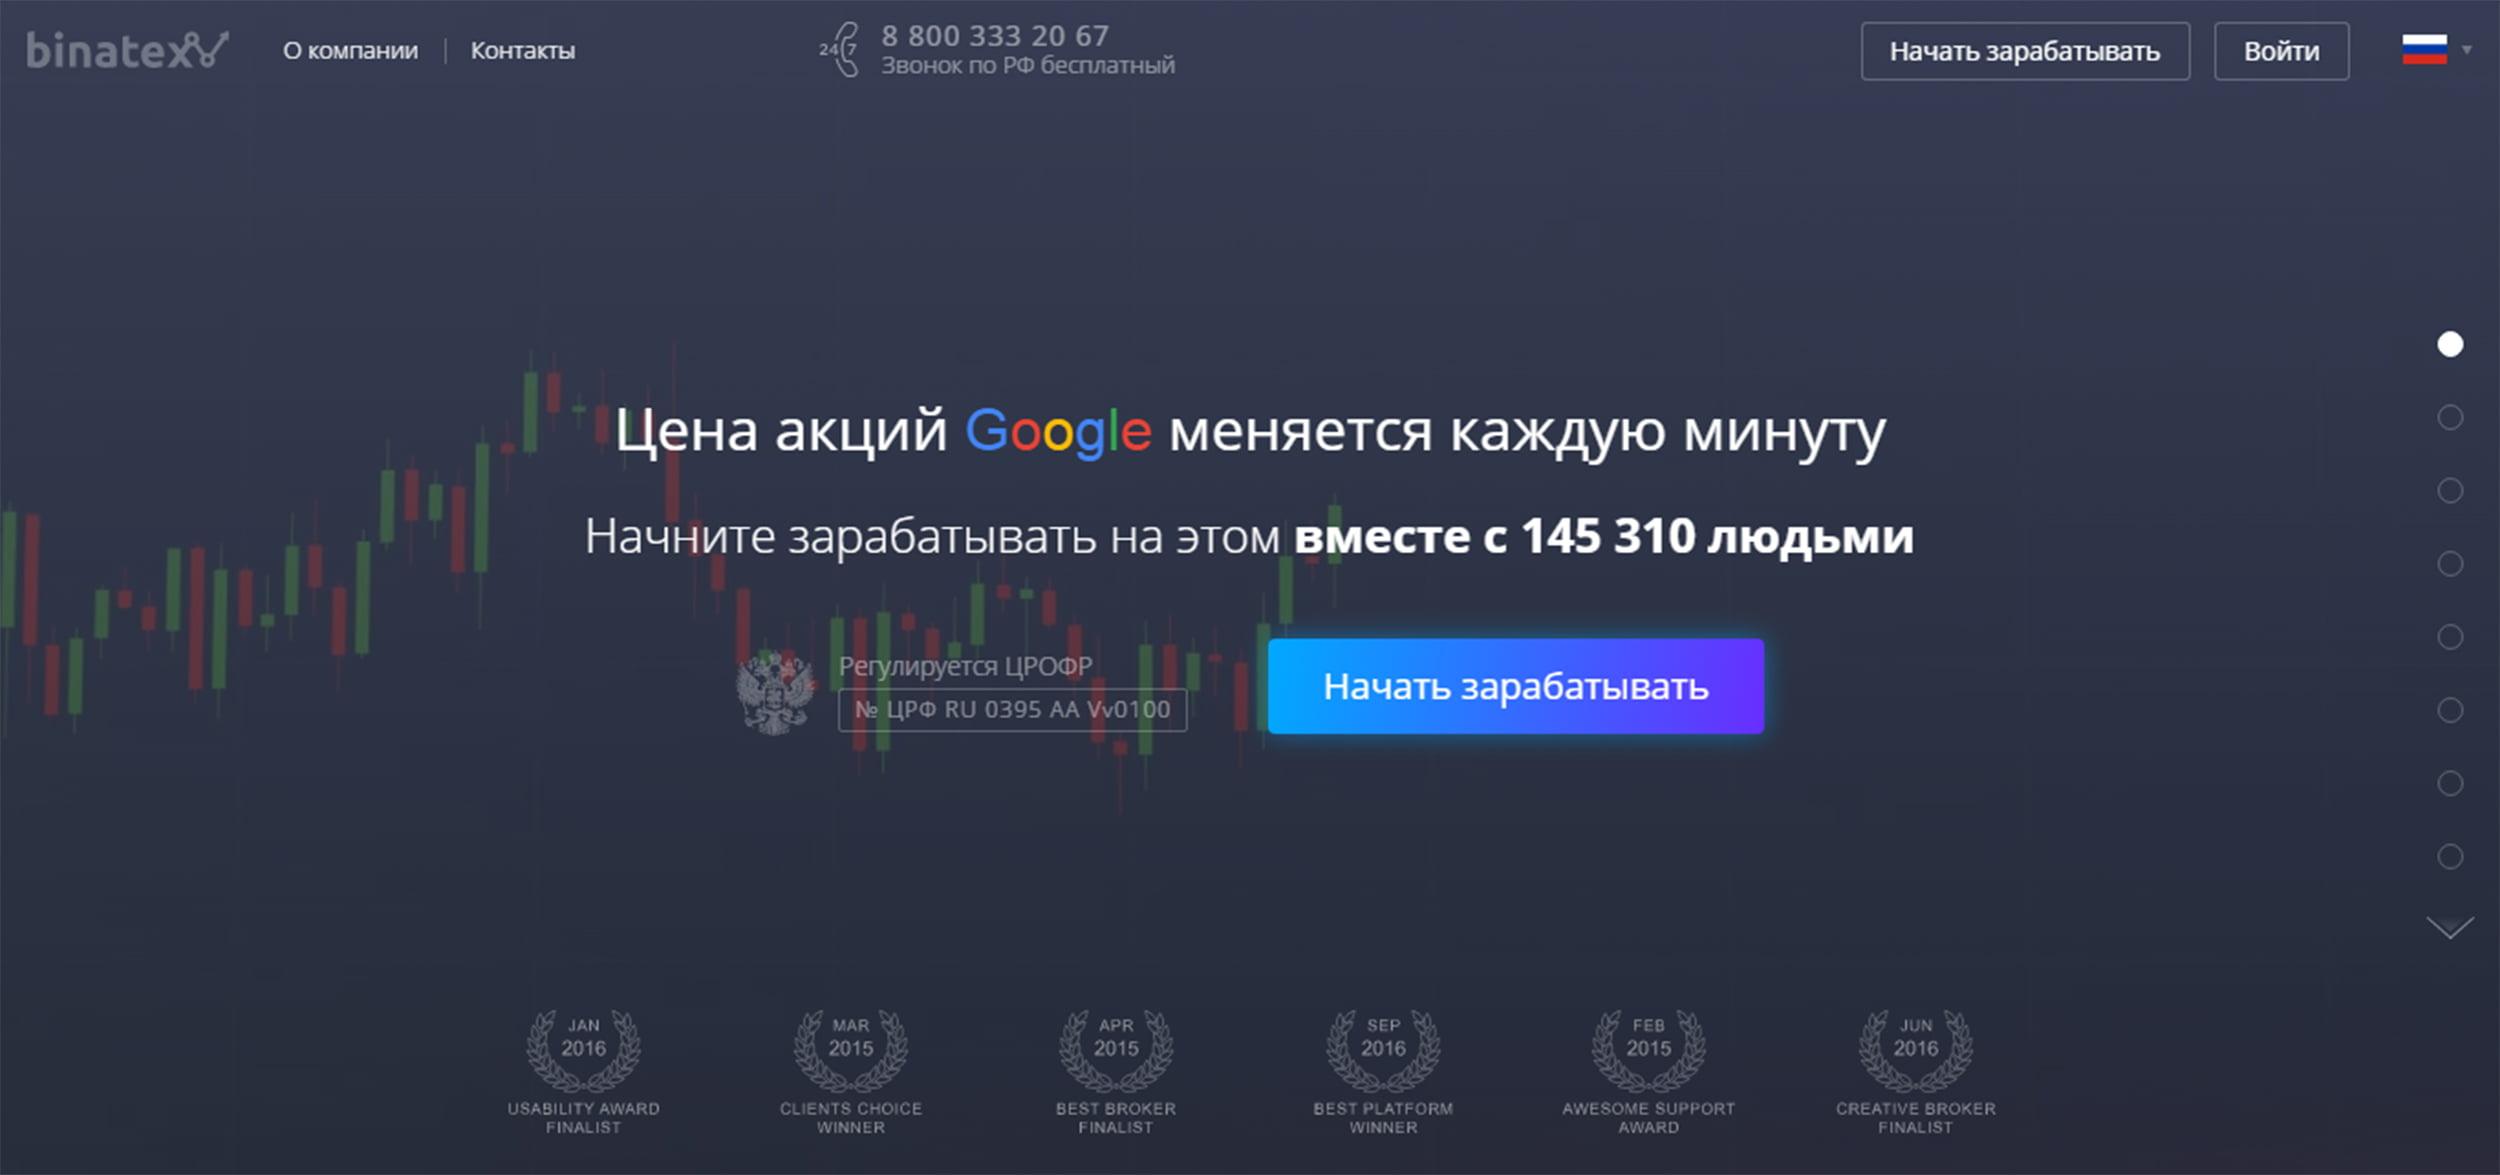 Binatex официальный сайт: https://binatex.com/ru